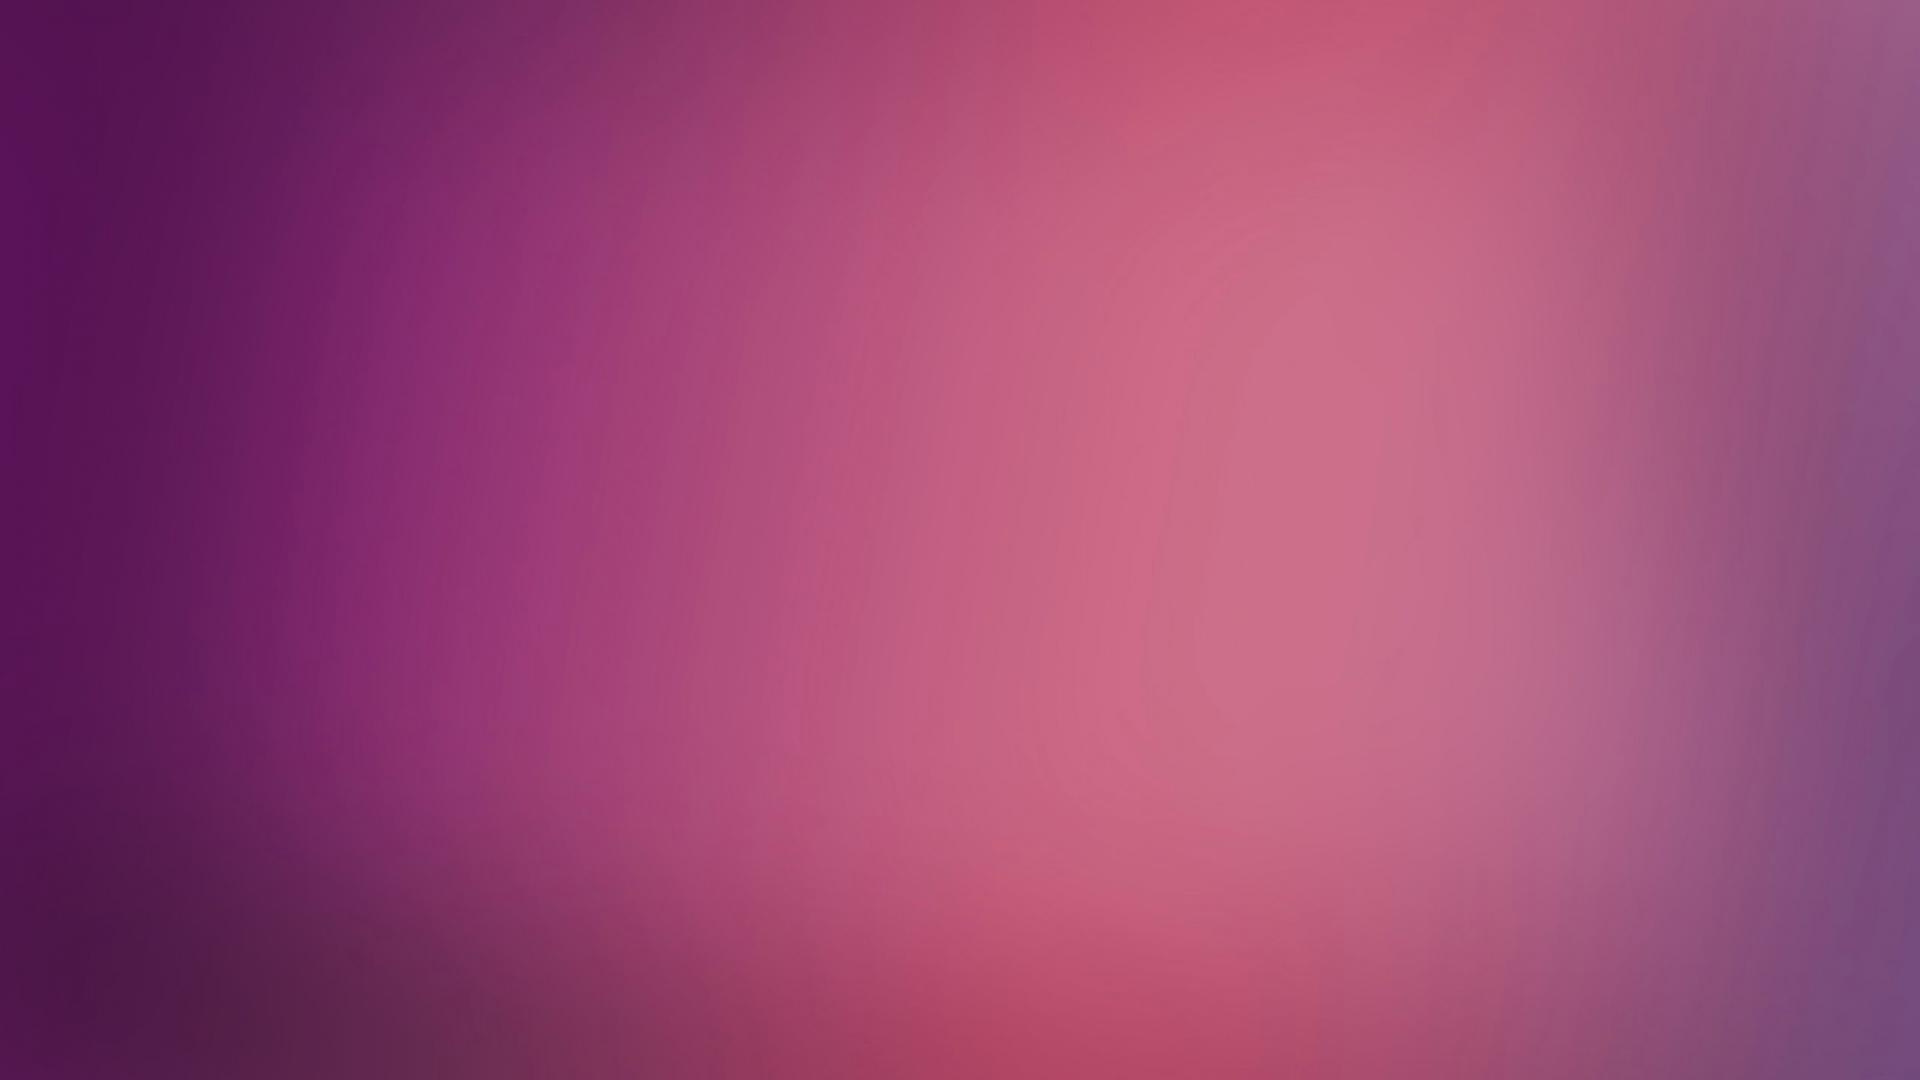 10. solid color wallpaper10